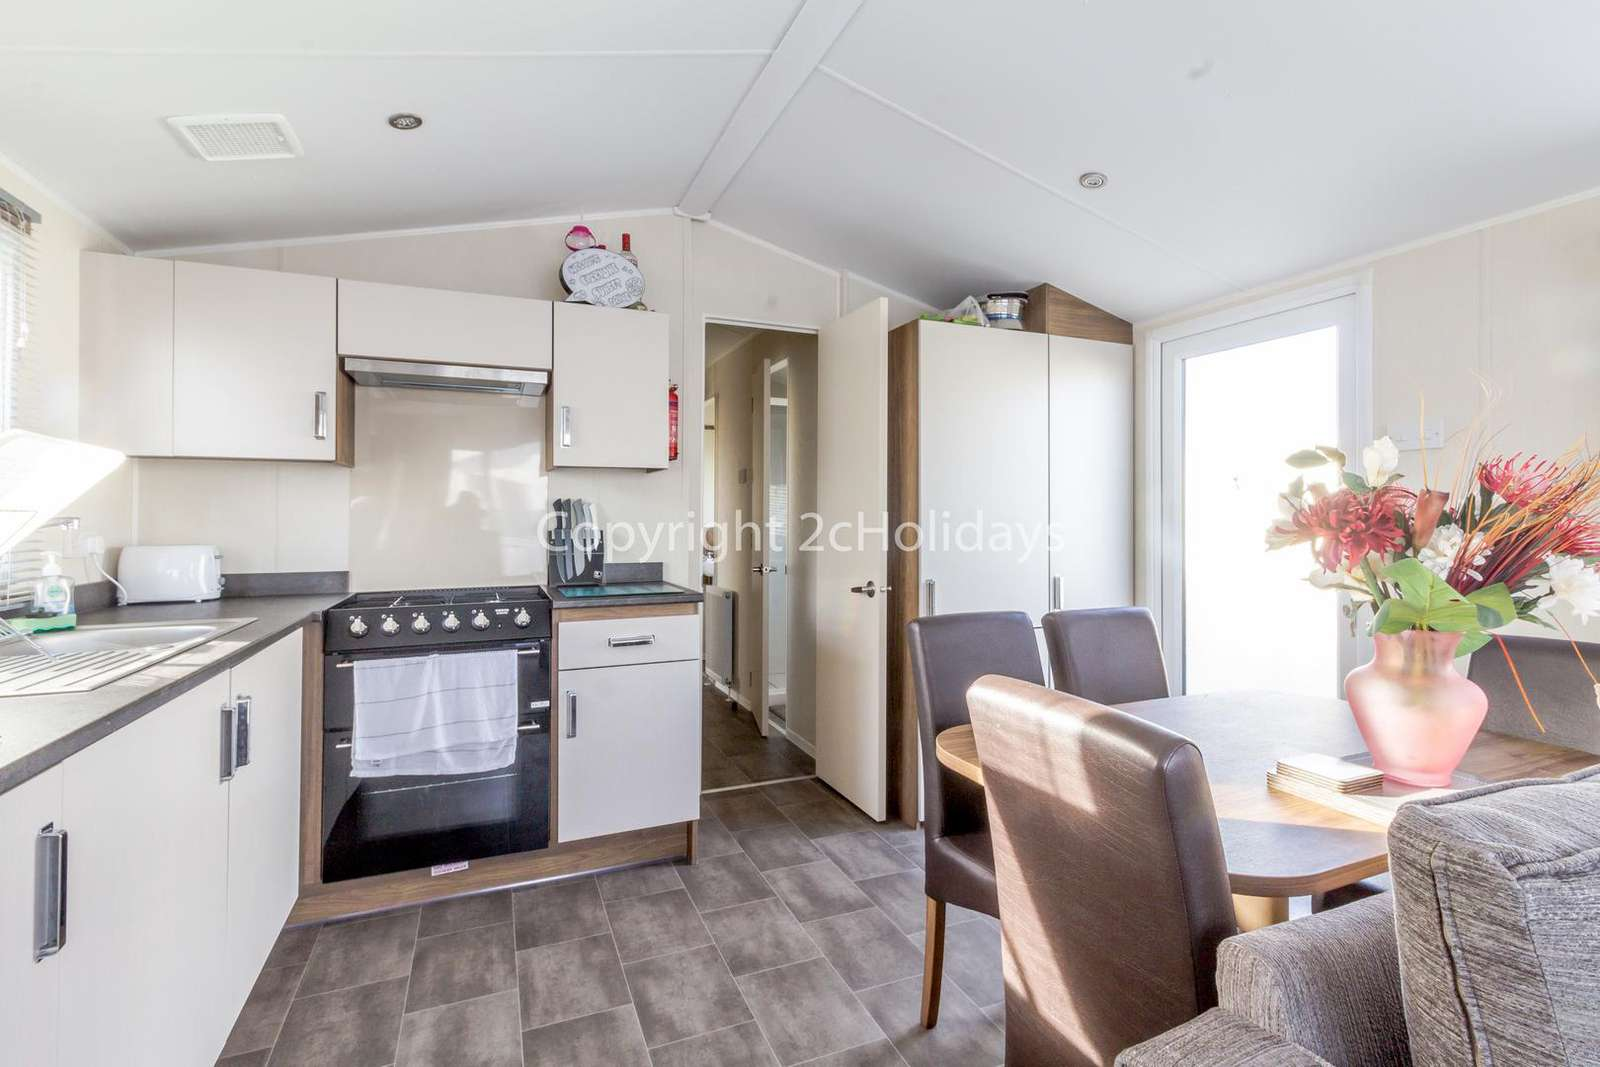 Spacious open plan kitchen/diner